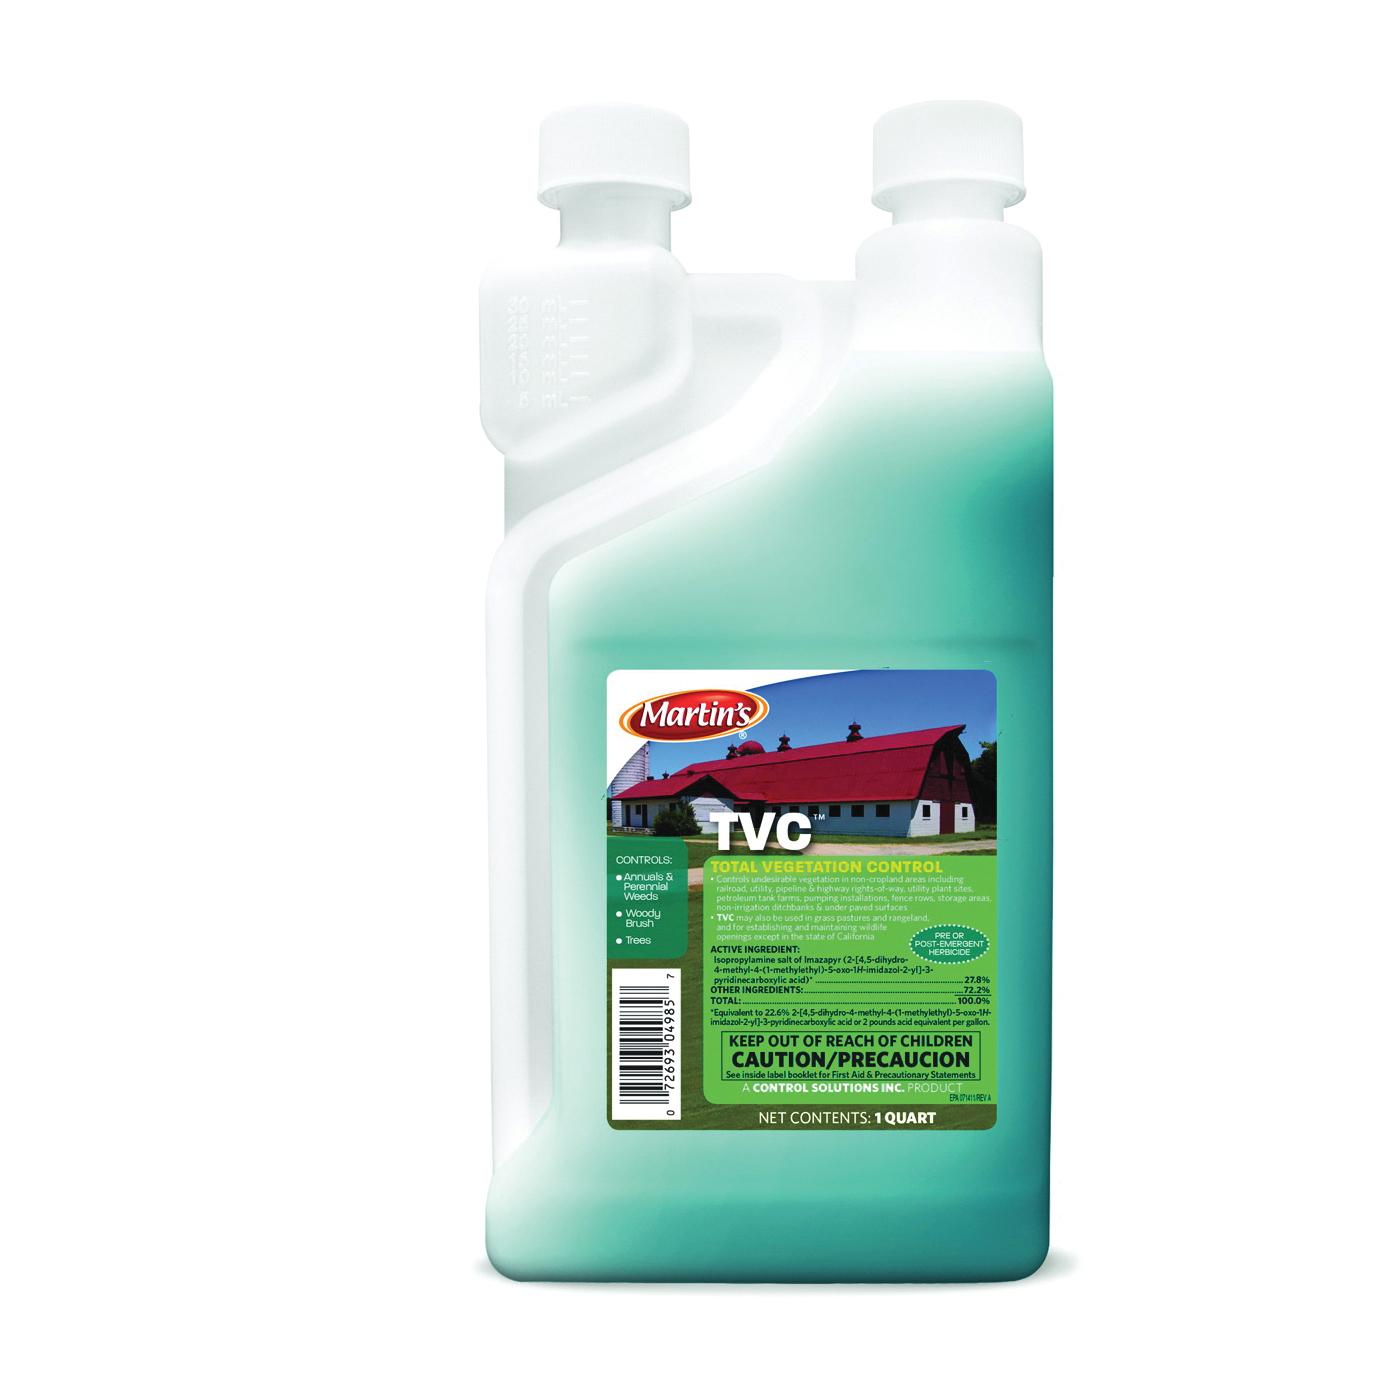 Picture of Martin's 82004985 Total Vegetation Control, Liquid, Light Amber, 1 qt Package, Bottle